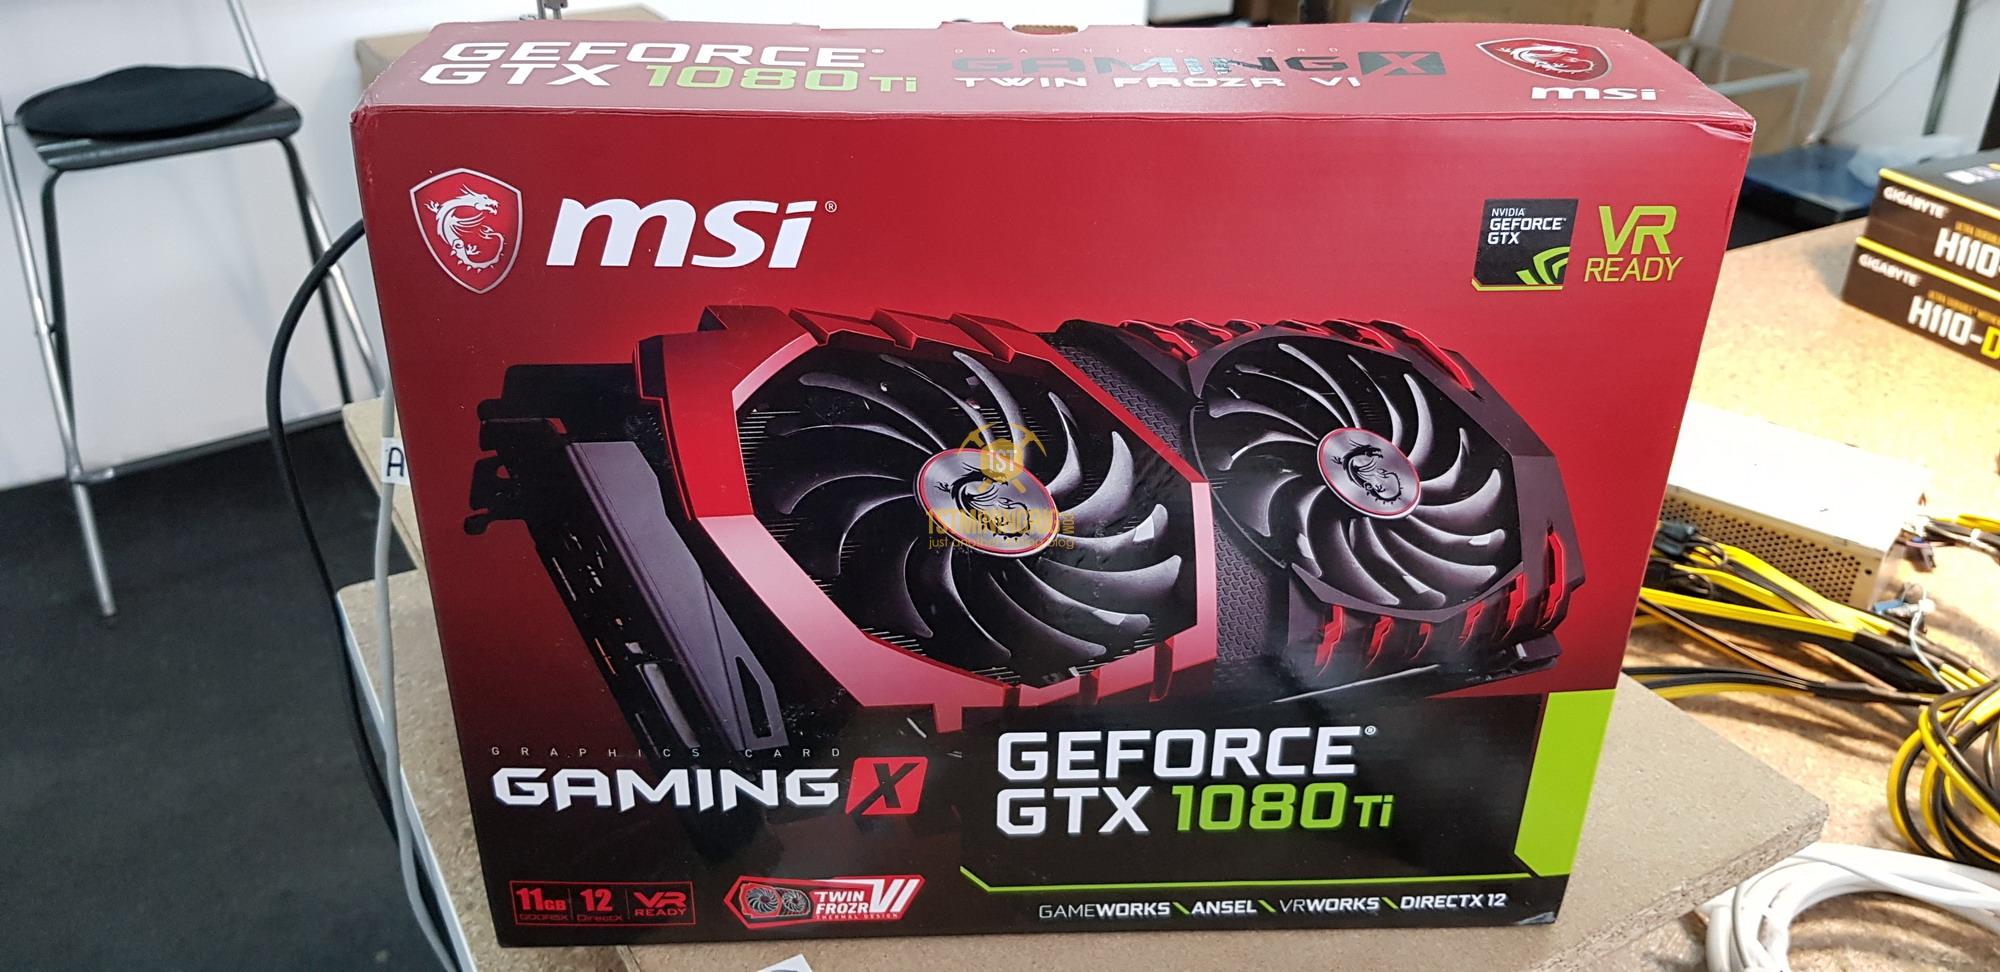 MSI GTX 1080 Ti Gaming X Mining Performance Review - 1st Mining Rig